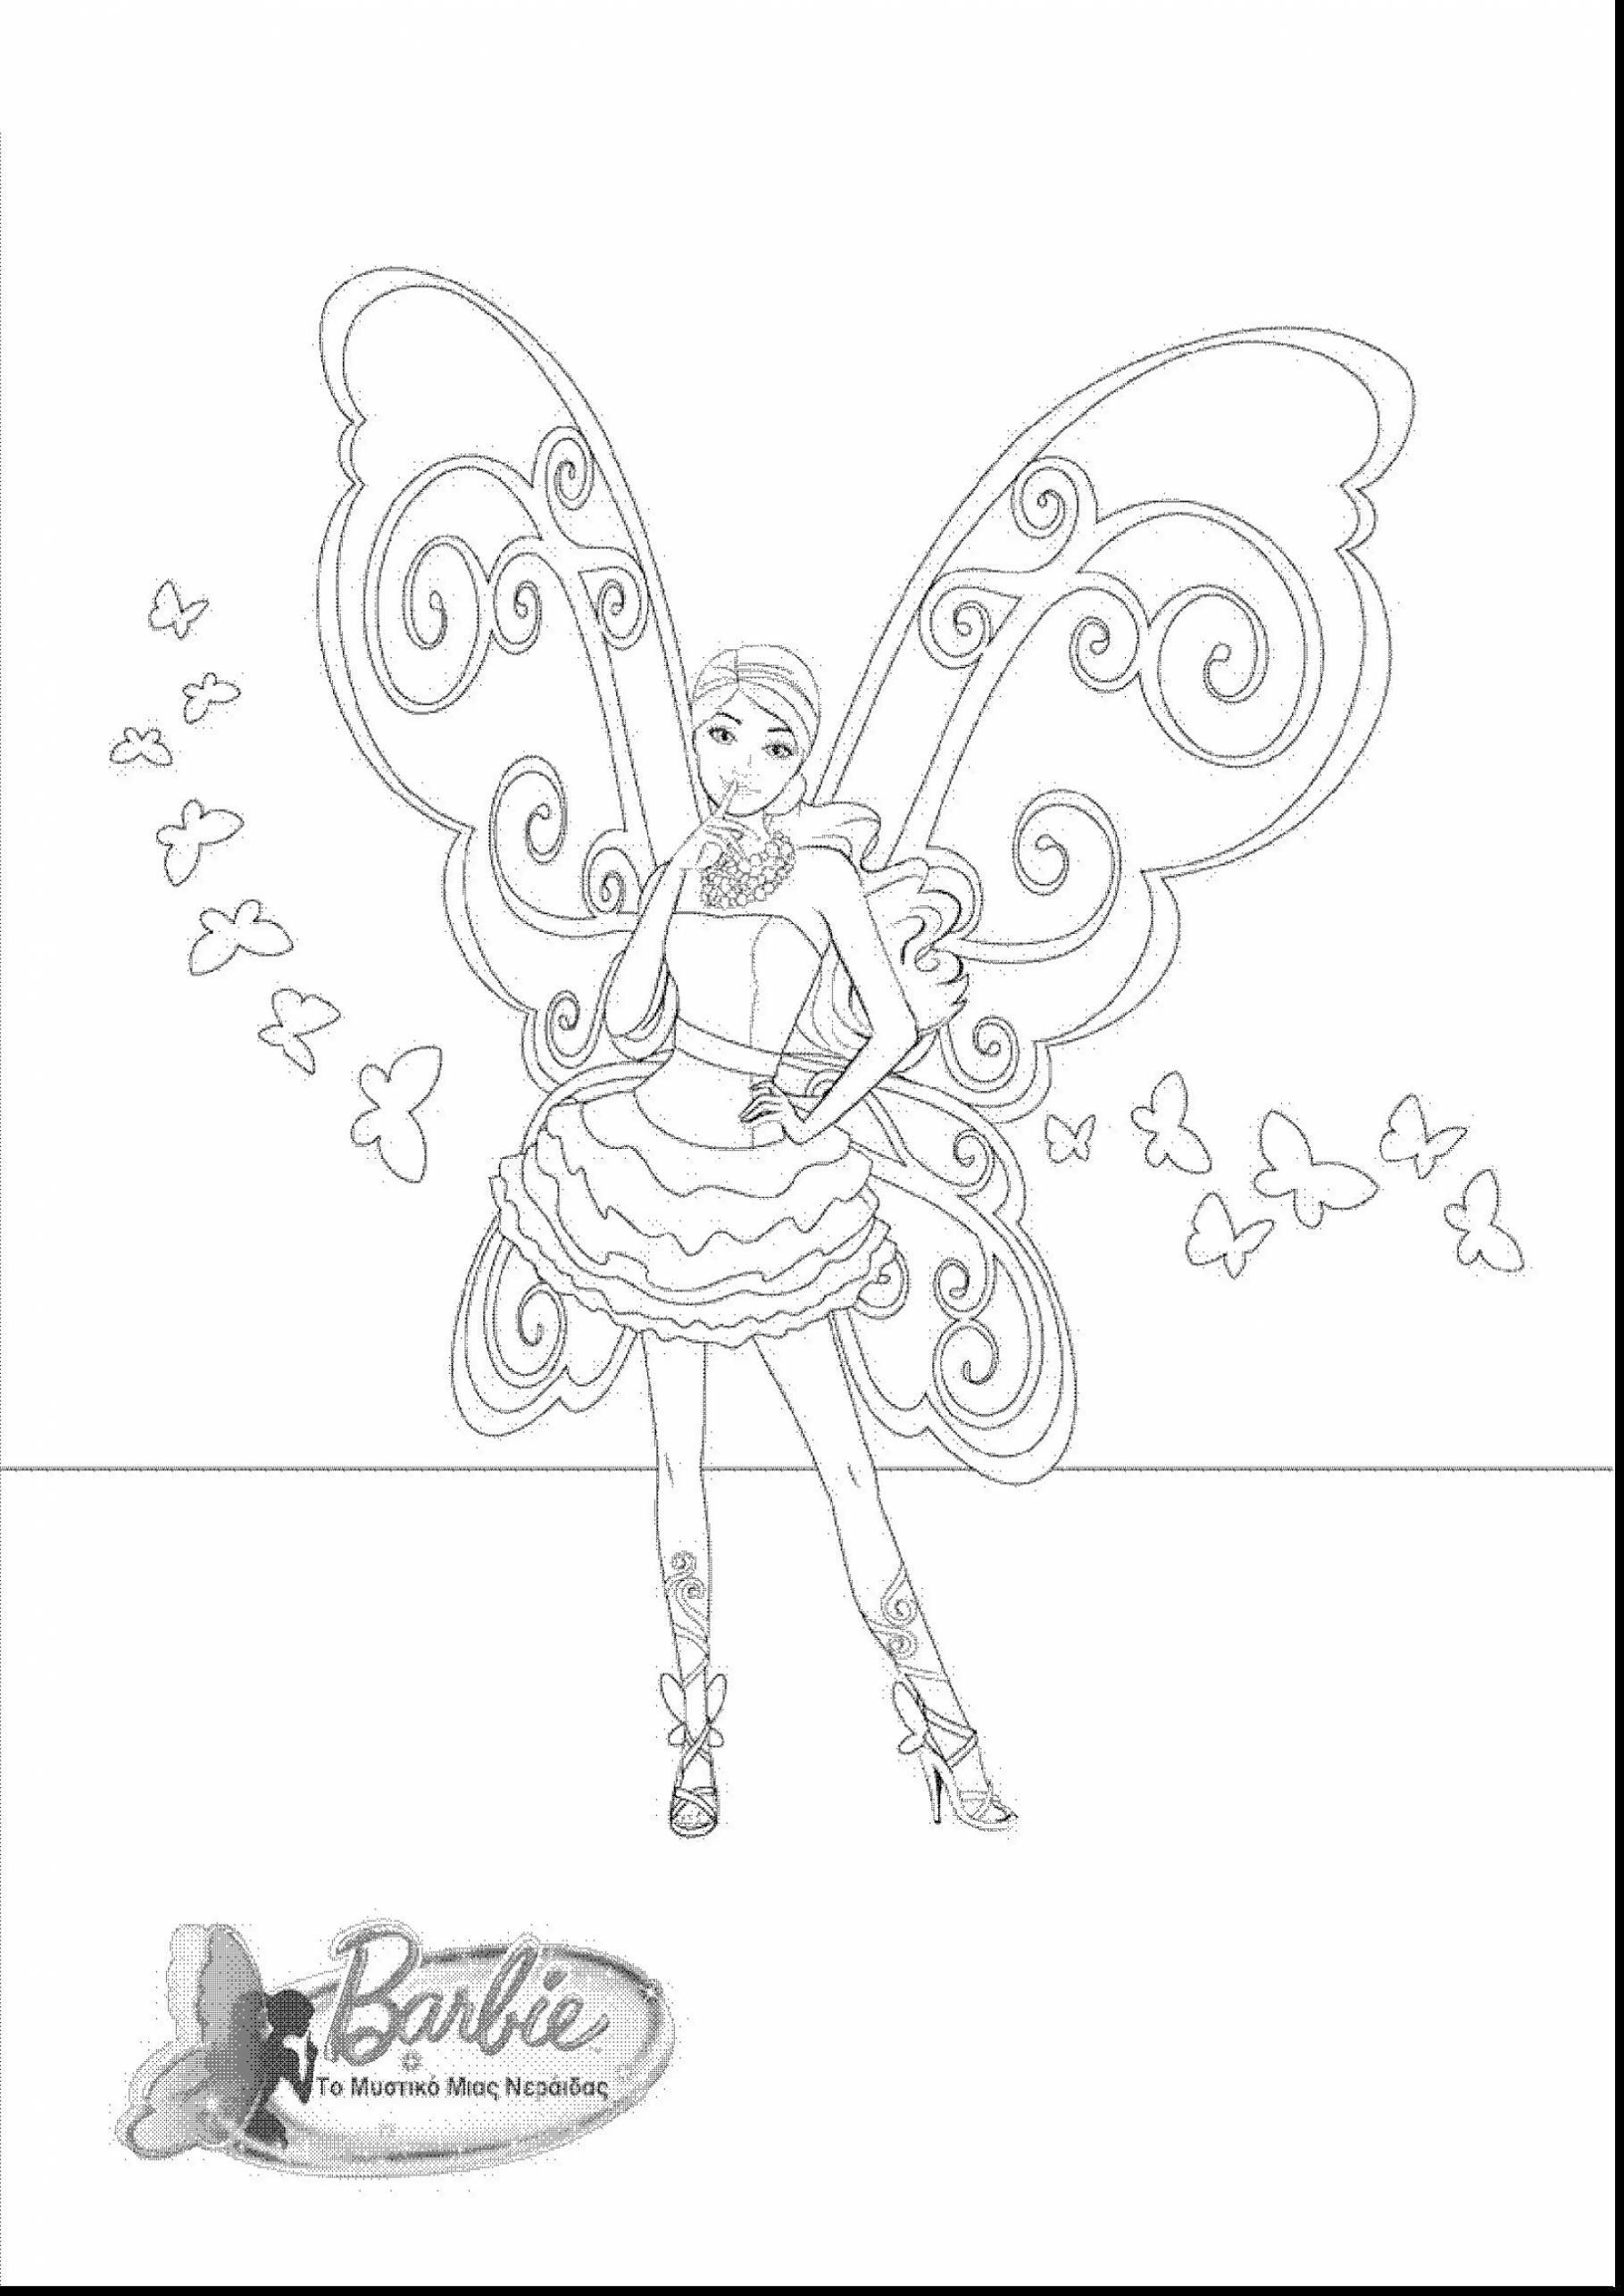 35 Coloring Pages Barbie Mermaidia Princess Coloring Pages Coloring Pages Fairy Coloring Pages